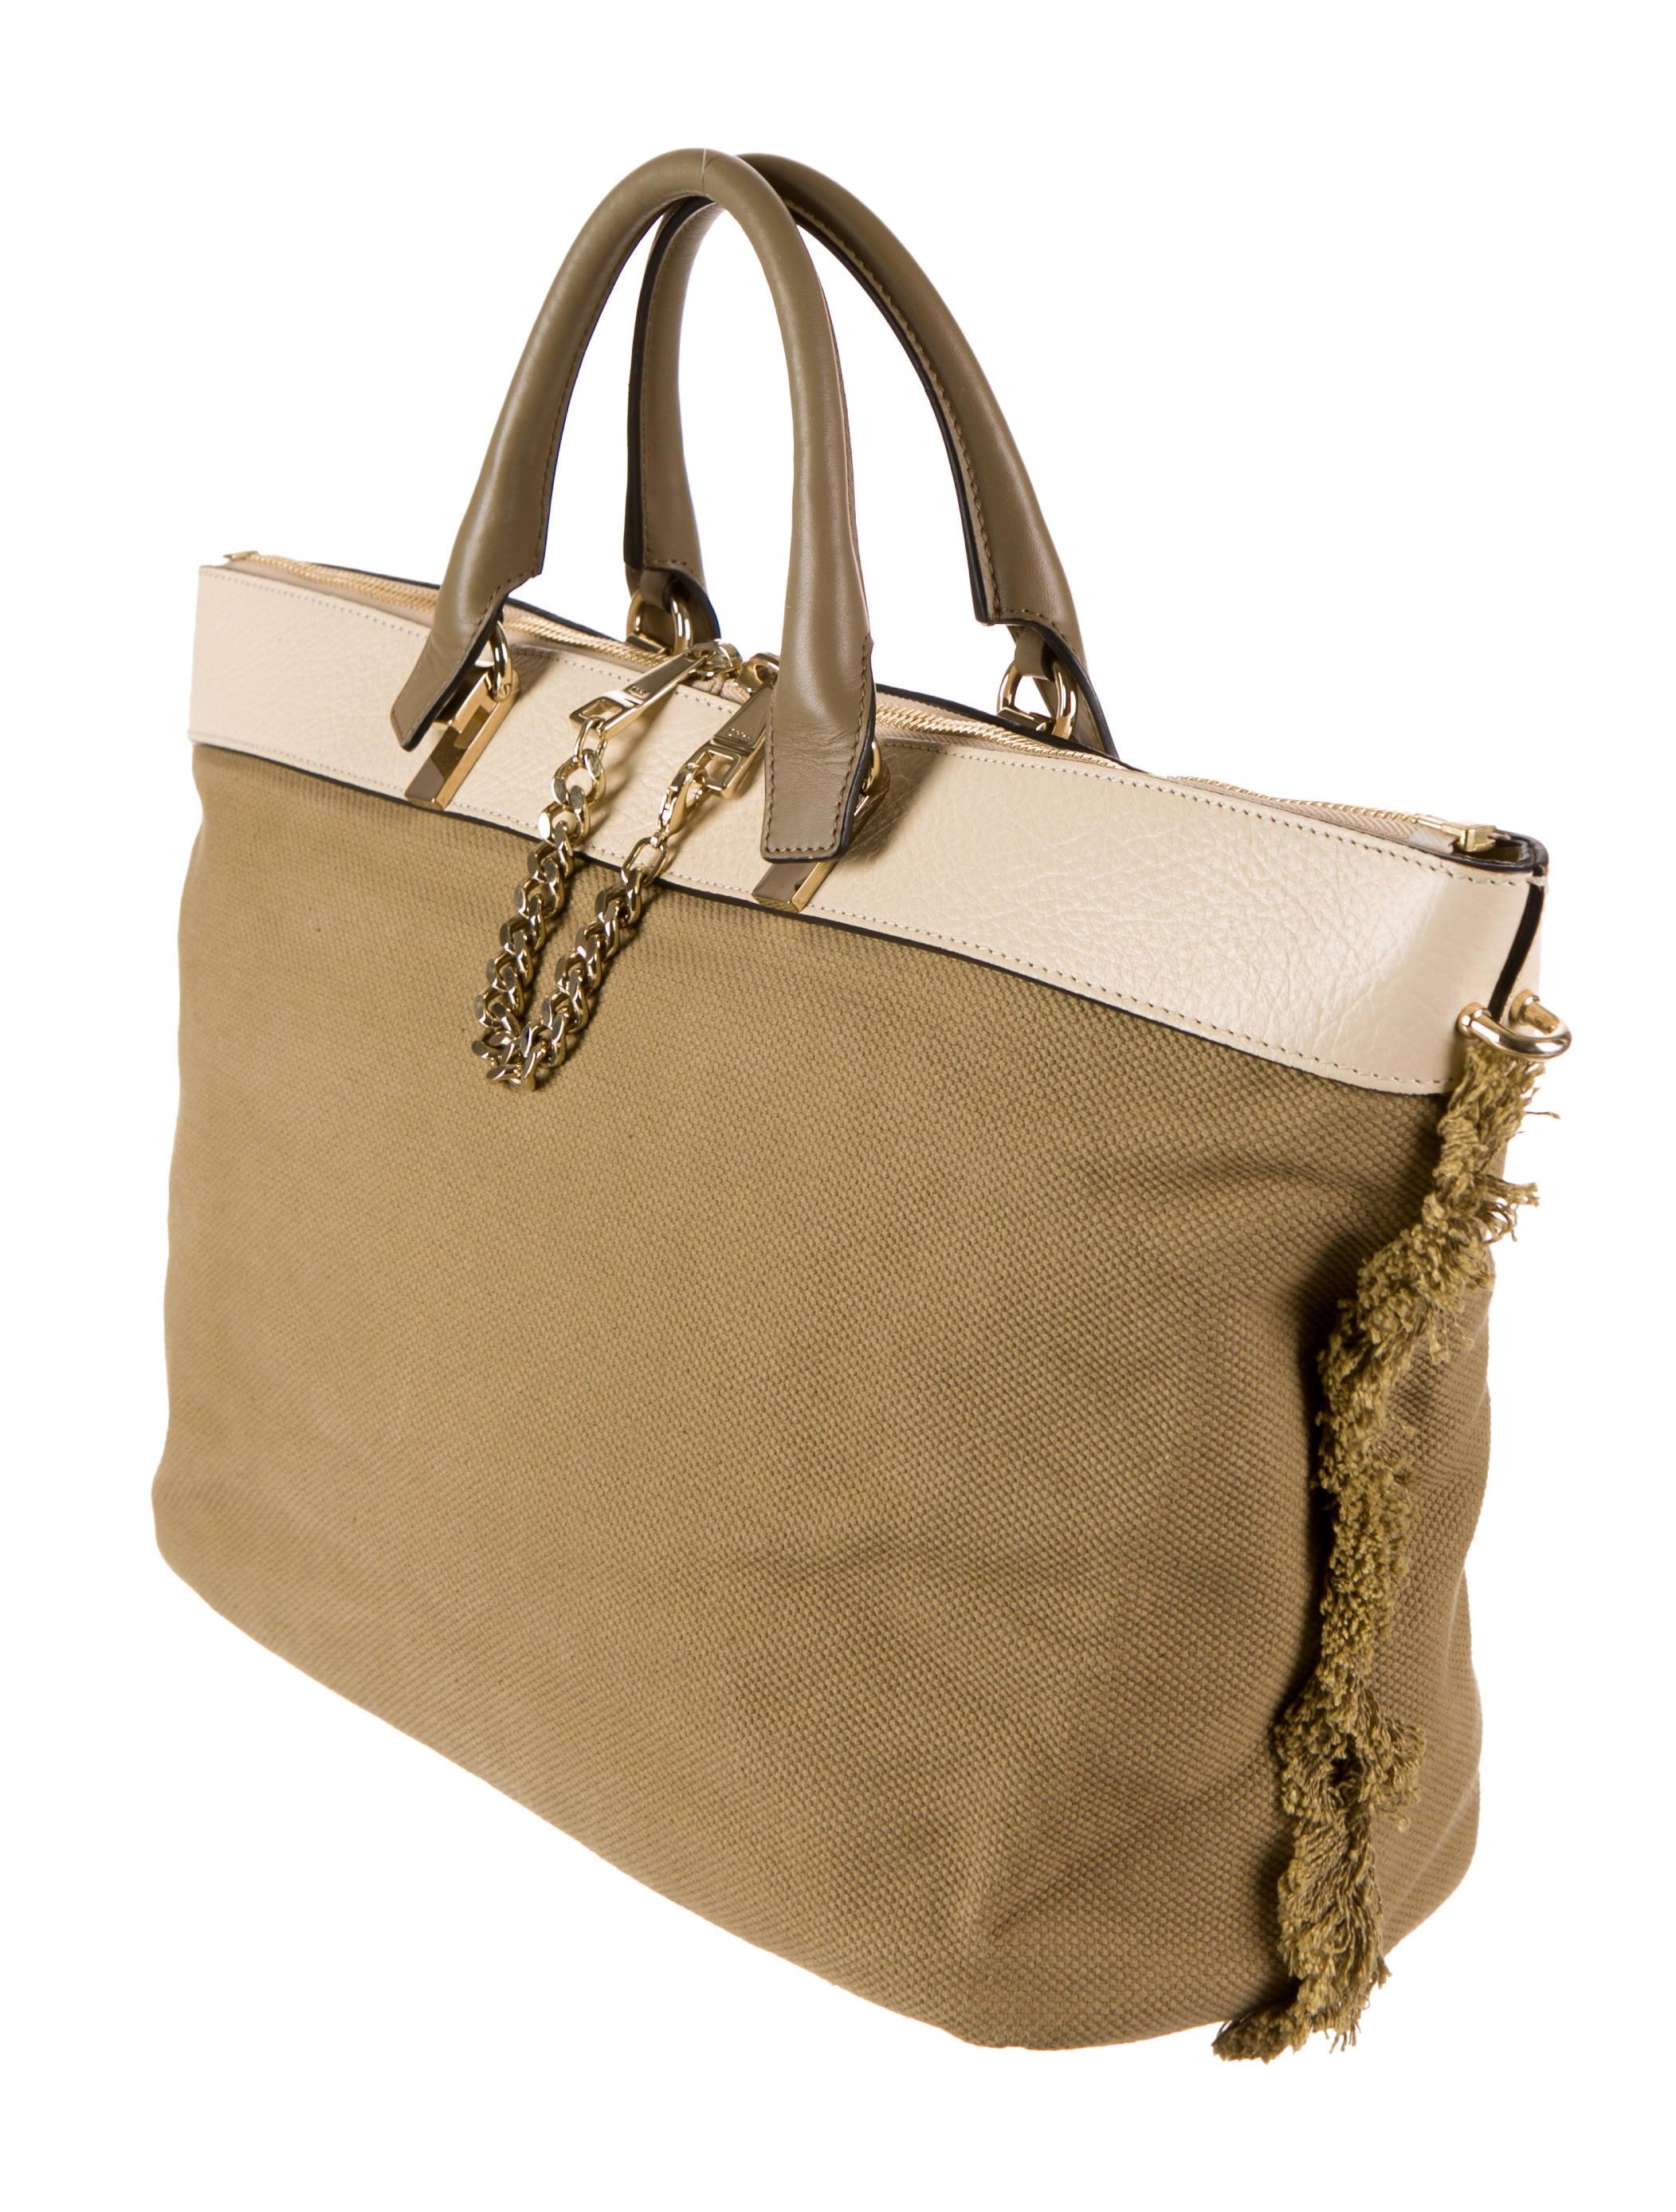 chloe large baylee satchel